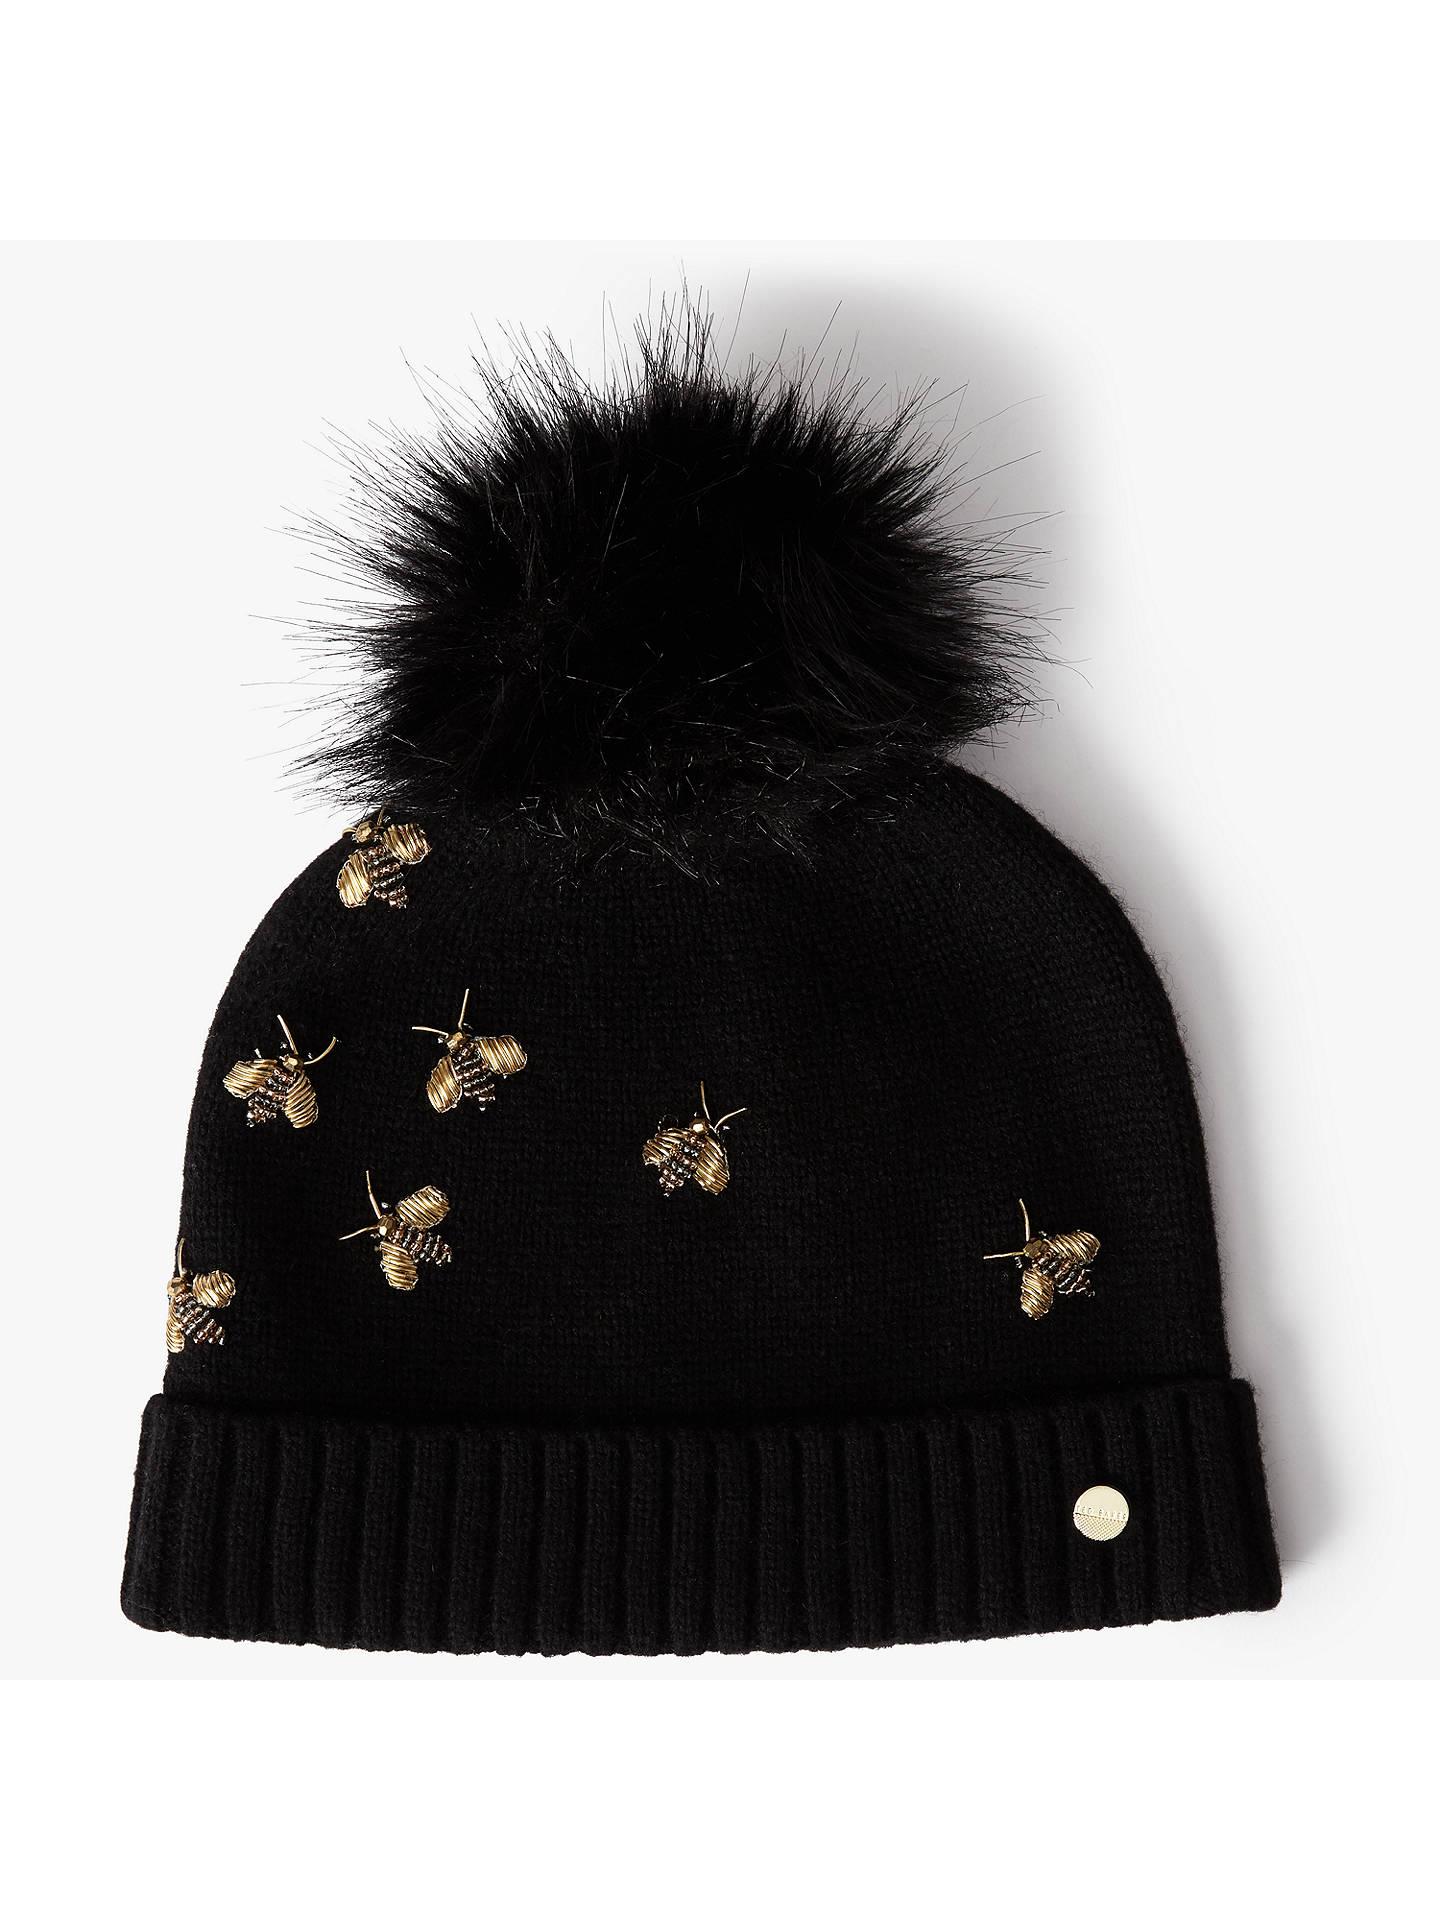 BuyTed Baker Arlea Bee Embellished Hat f480d268403d